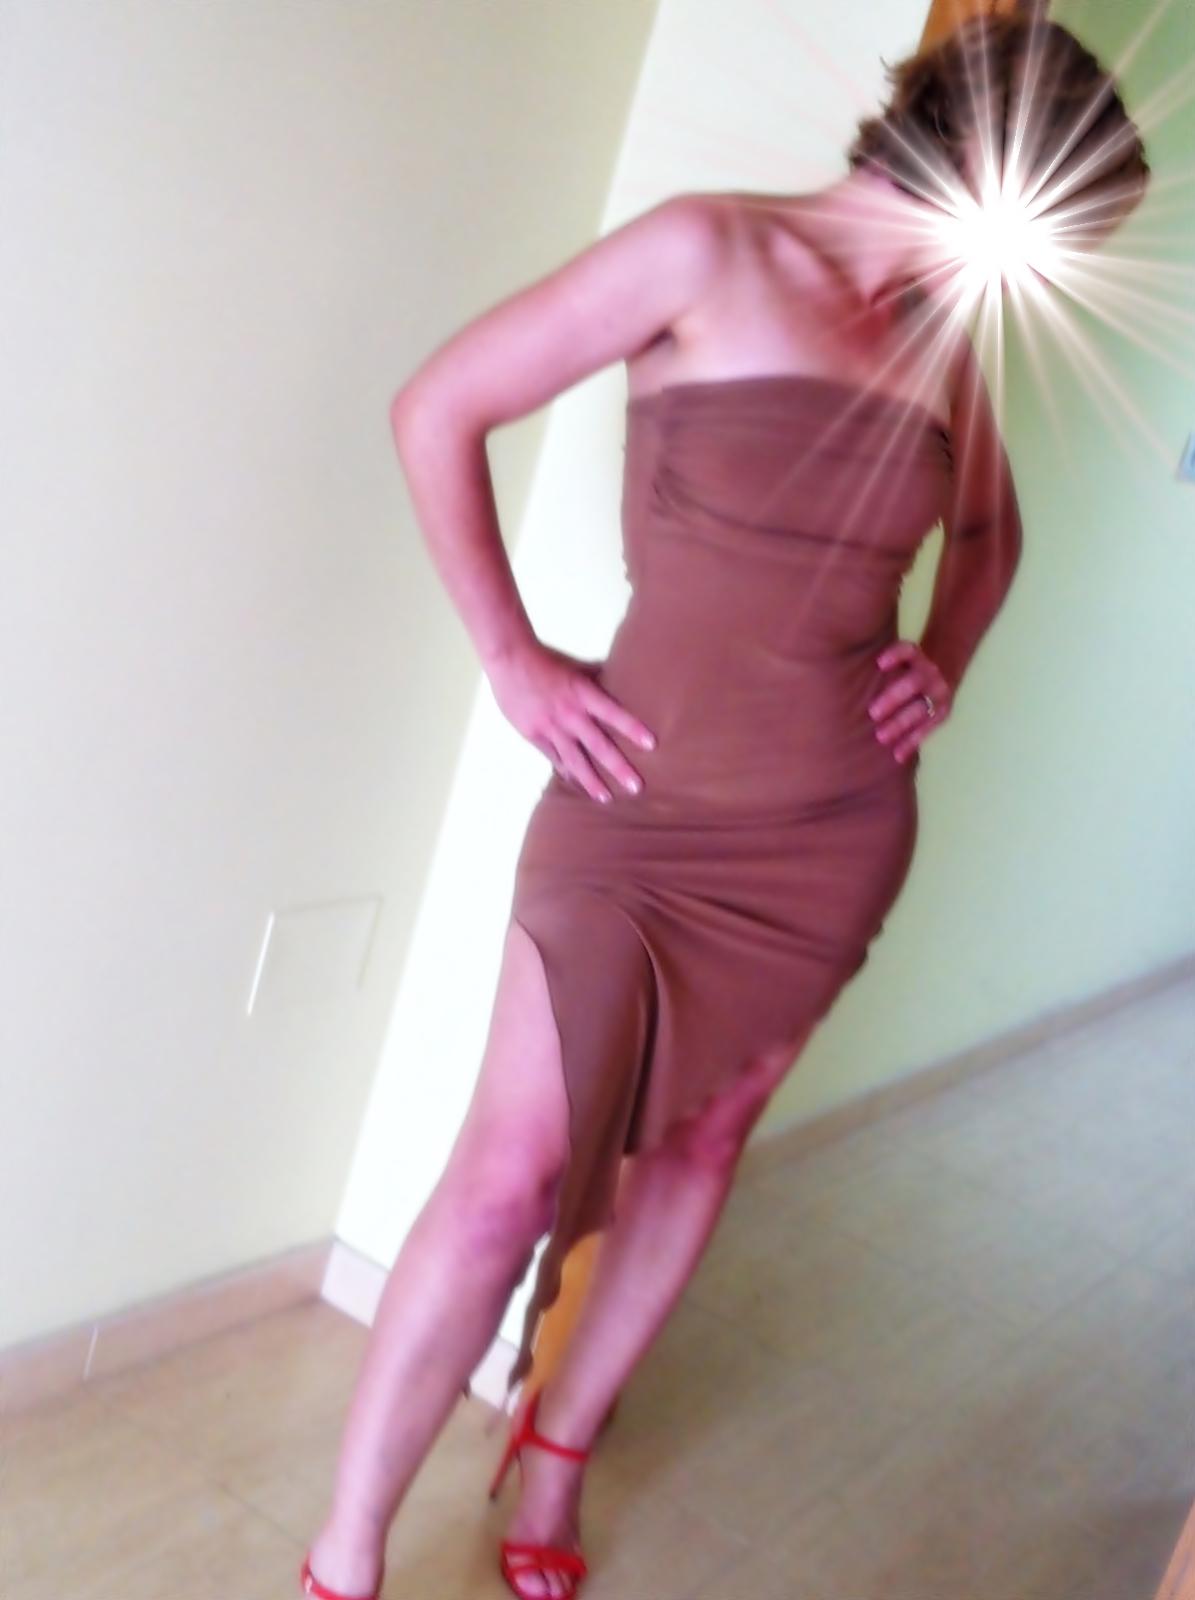 amante escort agency lisbon